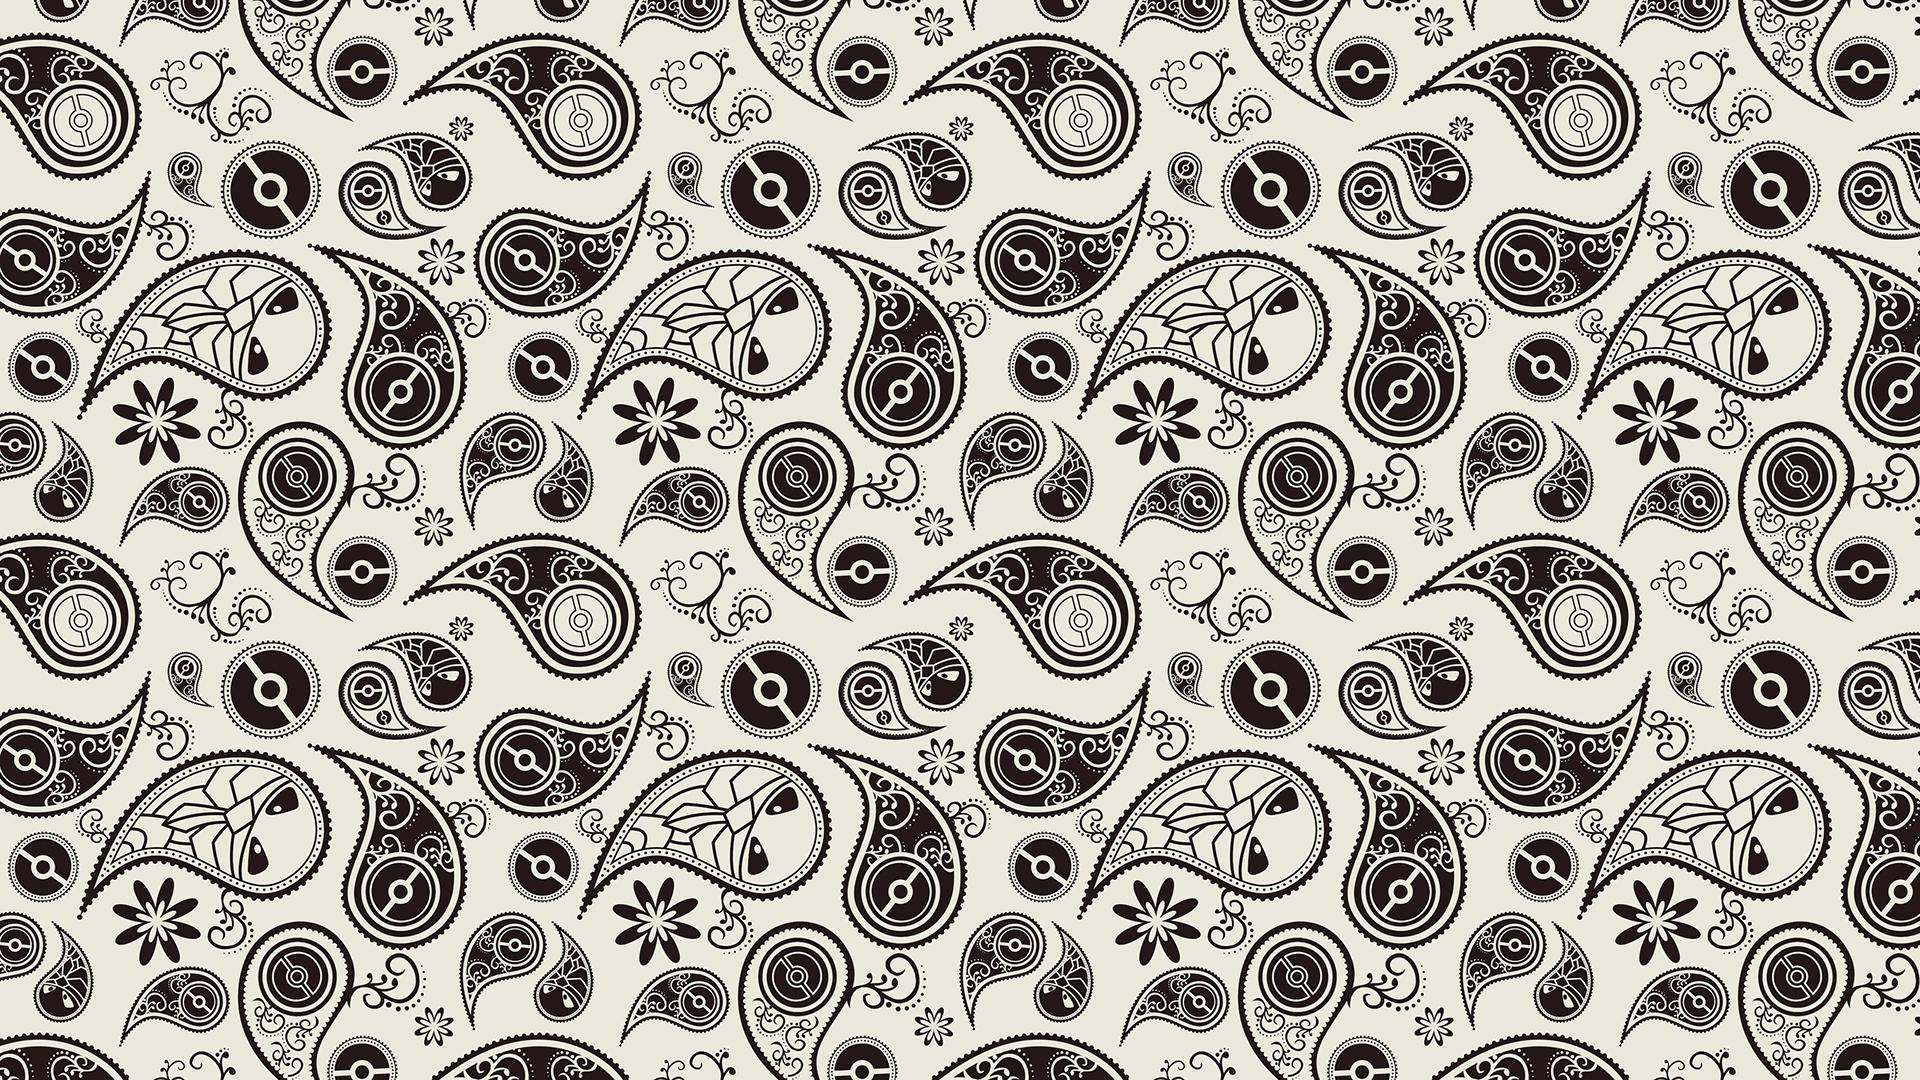 Wallpaper Pokemon Tile Cartoon Pattern 1920x1080